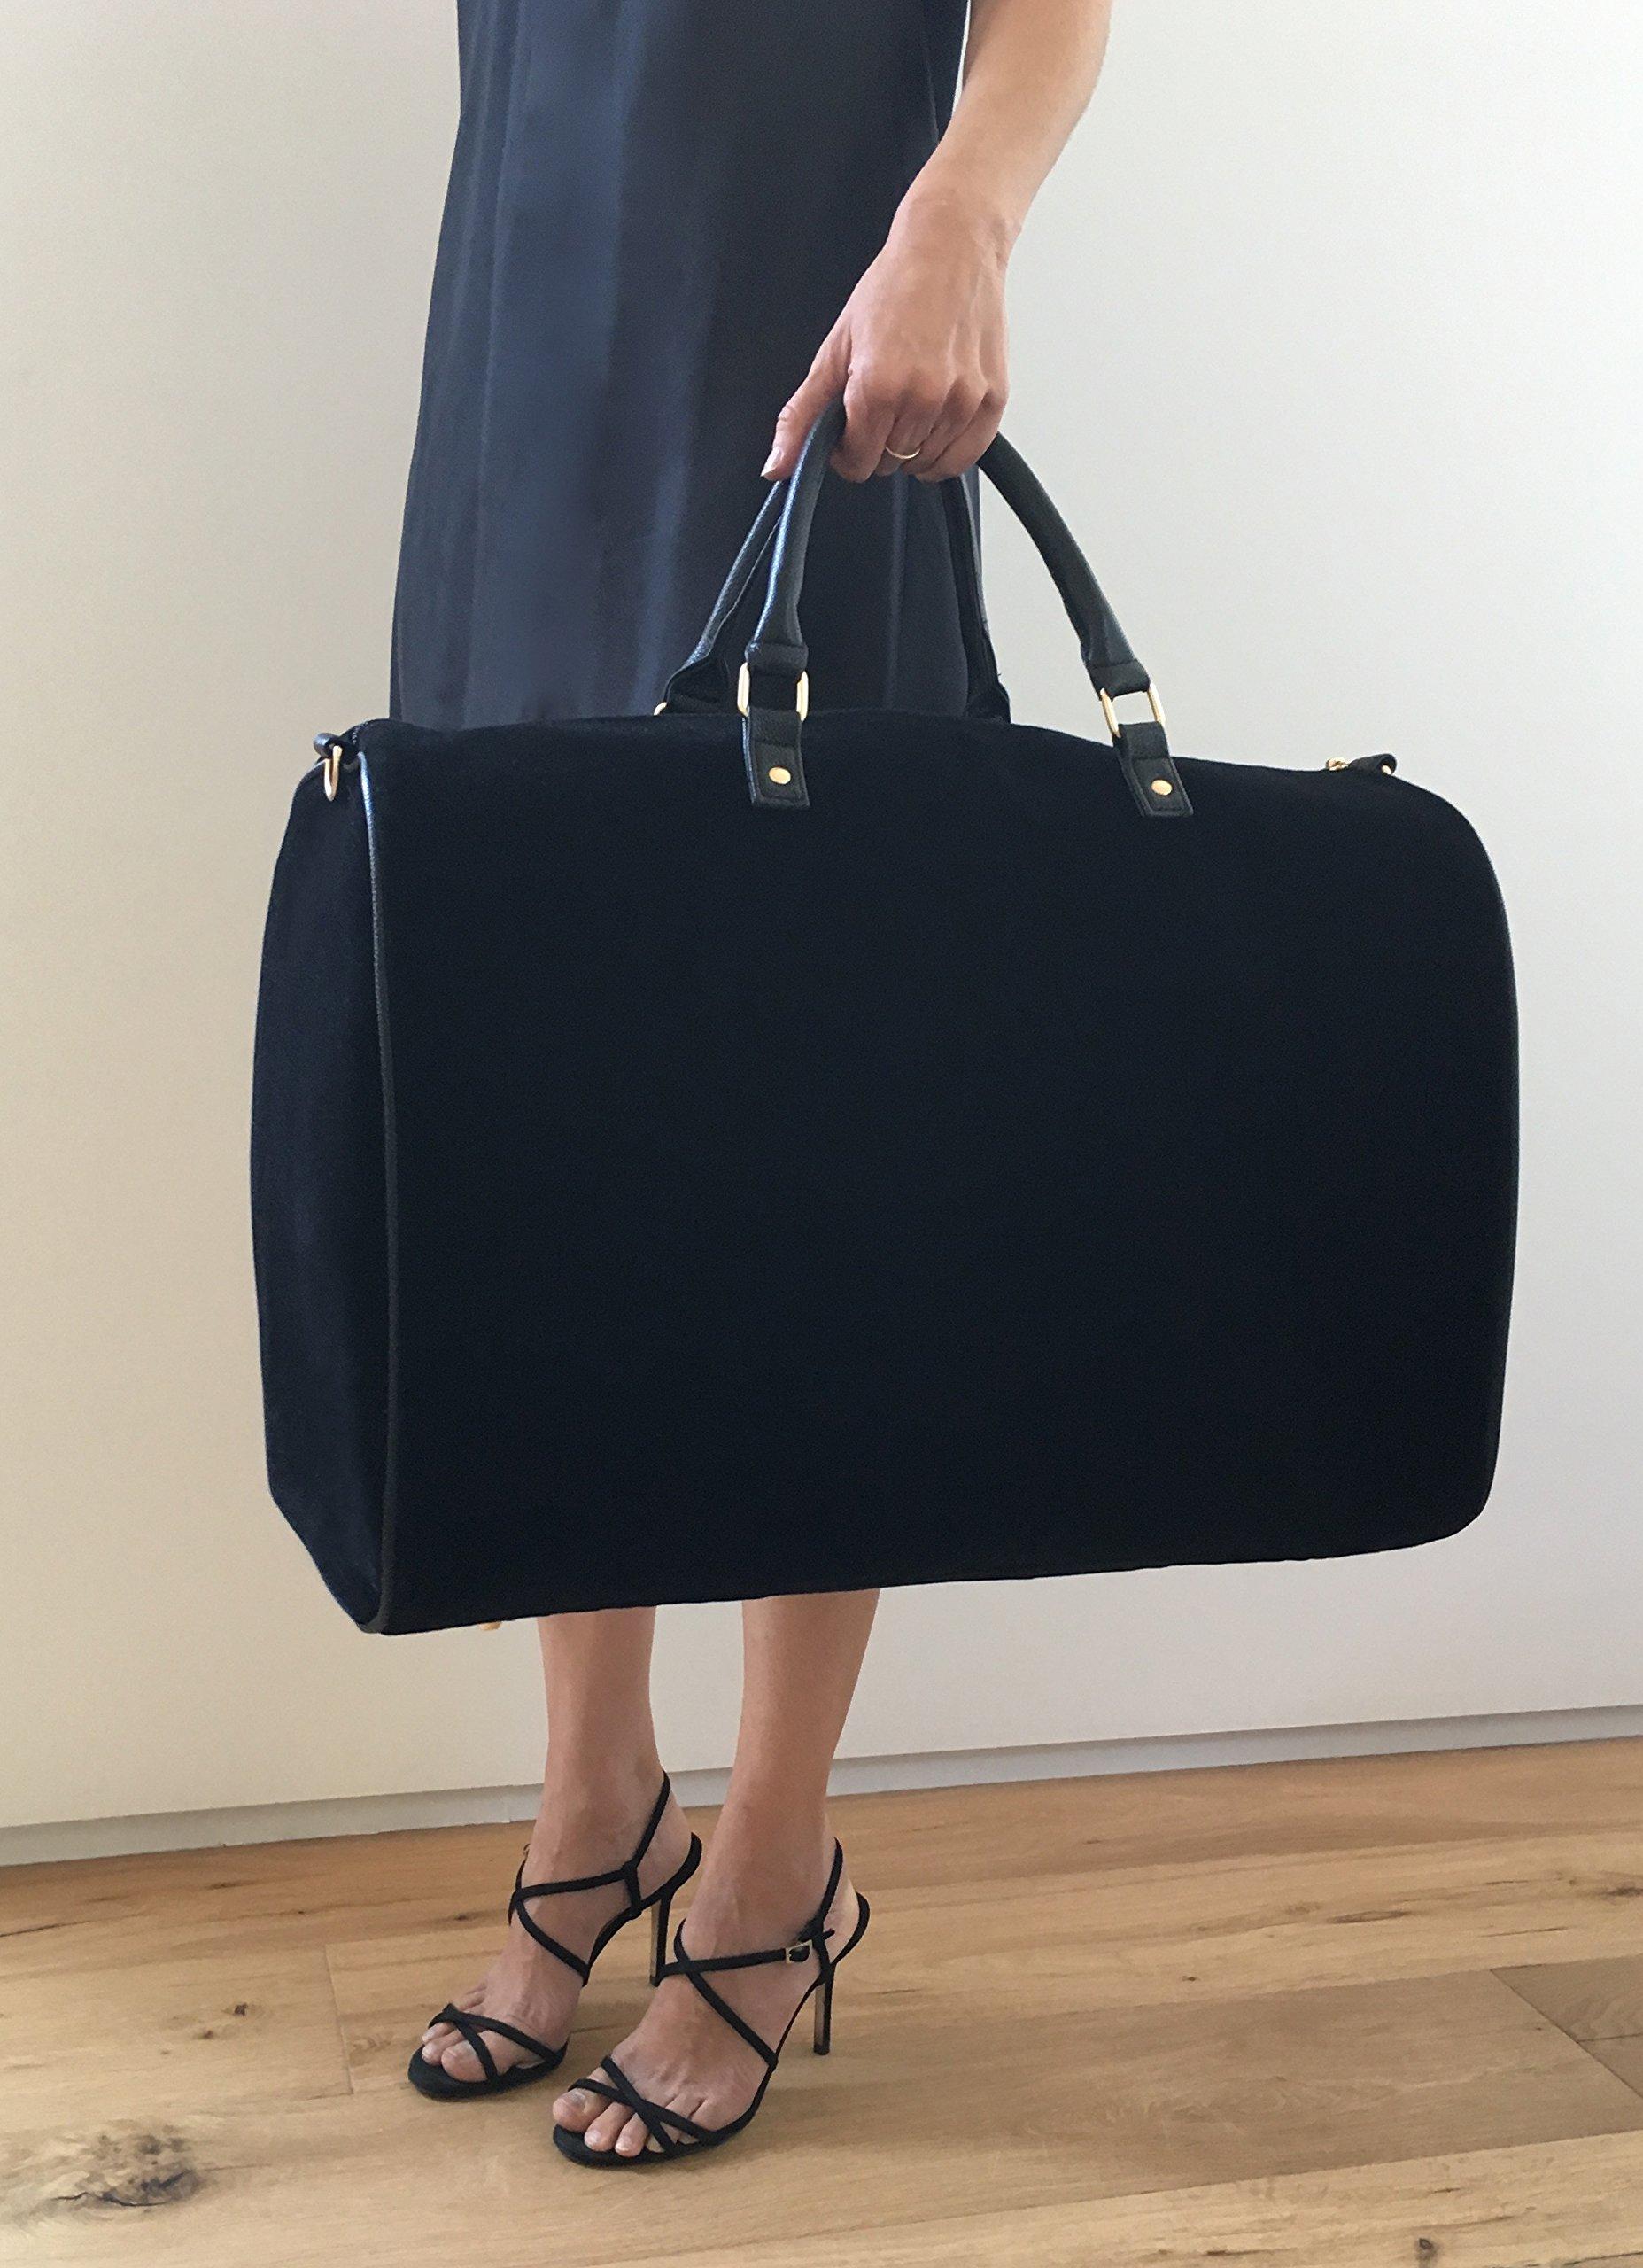 Limited Time Sale - Womens Black Velvet Weekender Bag, Duffle Bag, Overnight Bag, Travel Bag, Luggage, Large Tote Bag, Fashion Bag, Durable Bag, Best Handbag for women (Classic Black) - MSRP $99 by Lulu Dharma (Image #2)